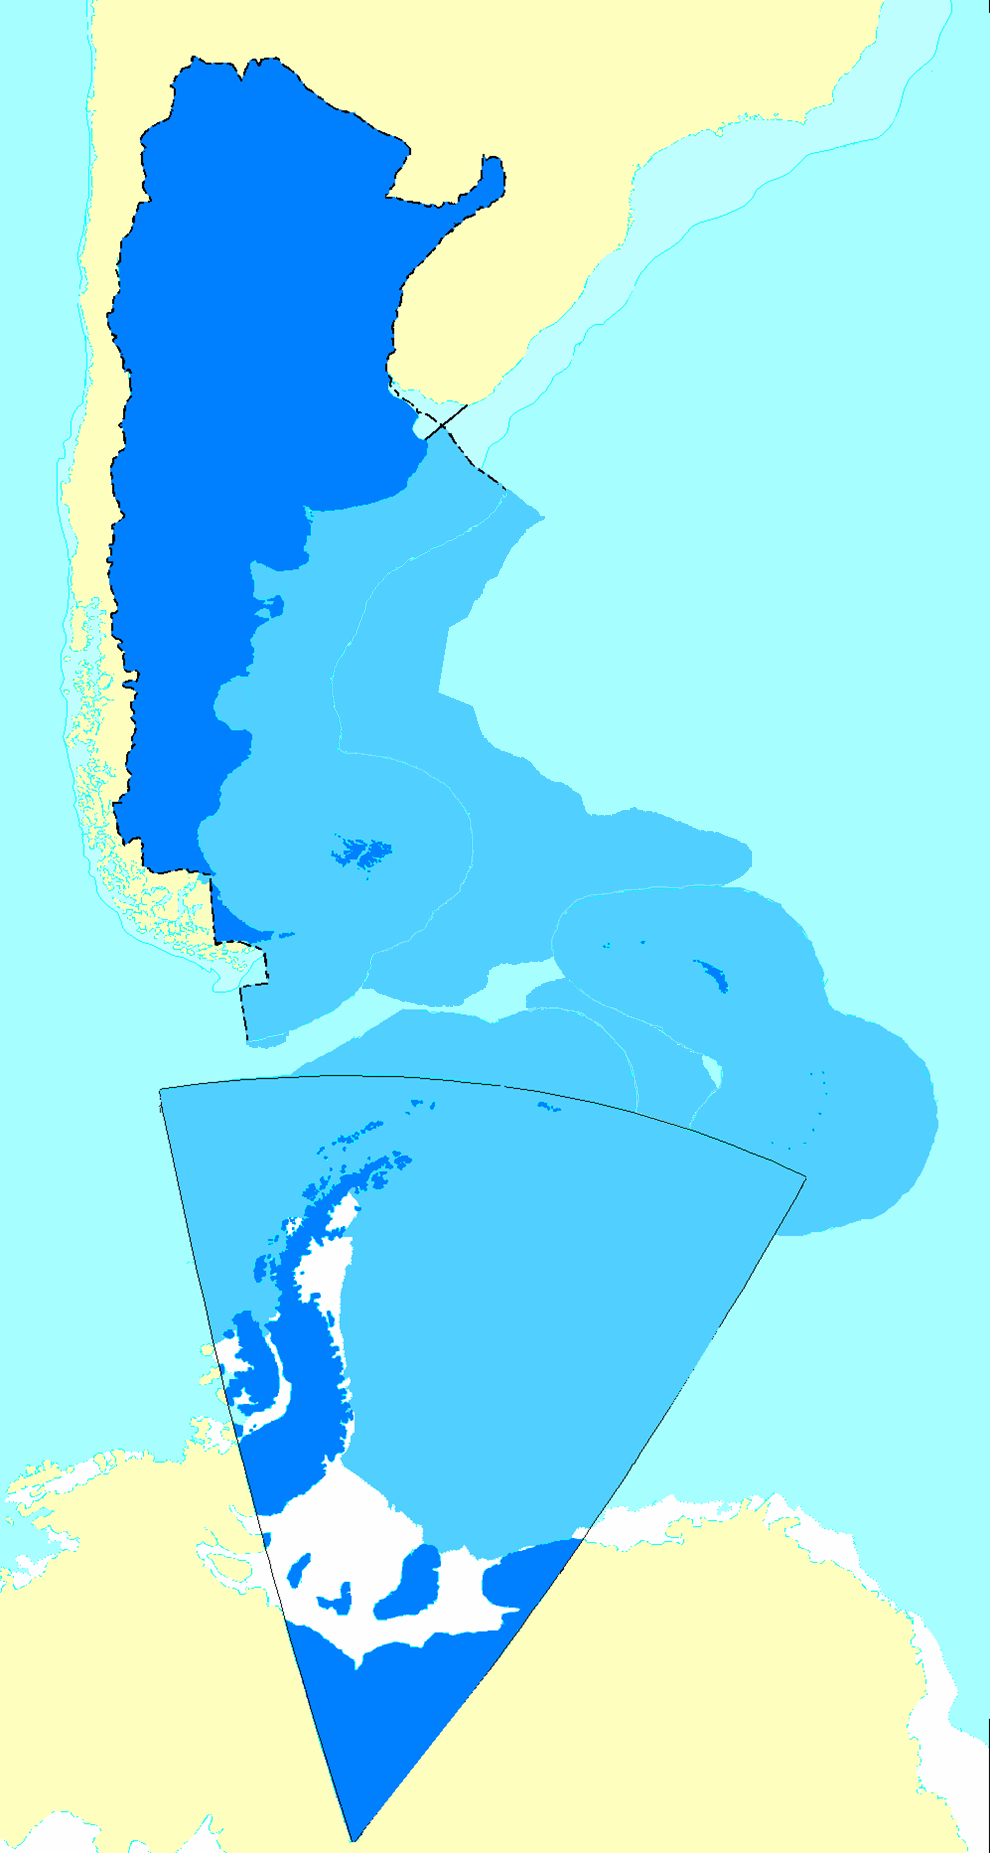 Depiction of Irredentismo argentino